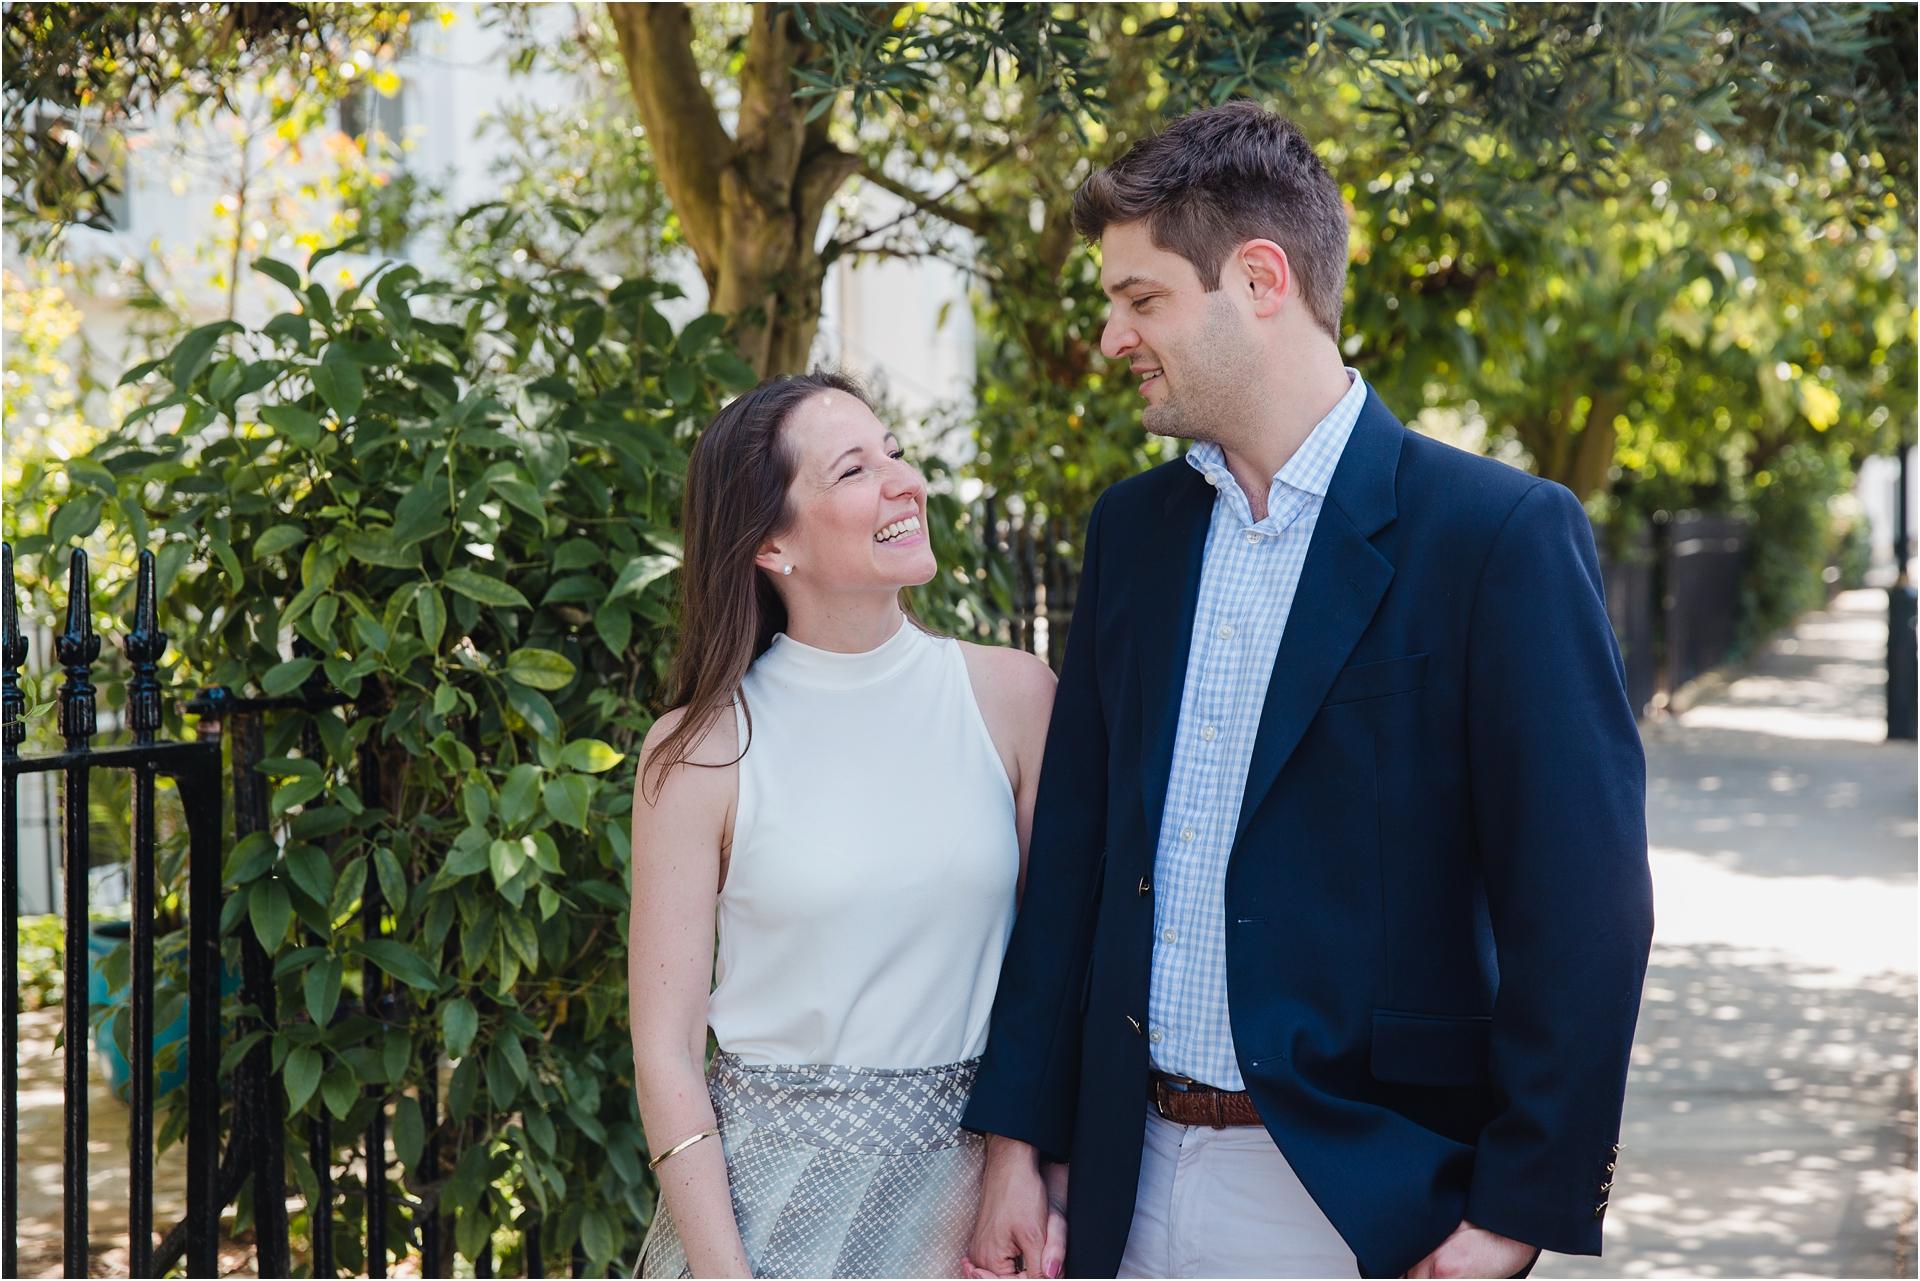 Engagement session in Kensington